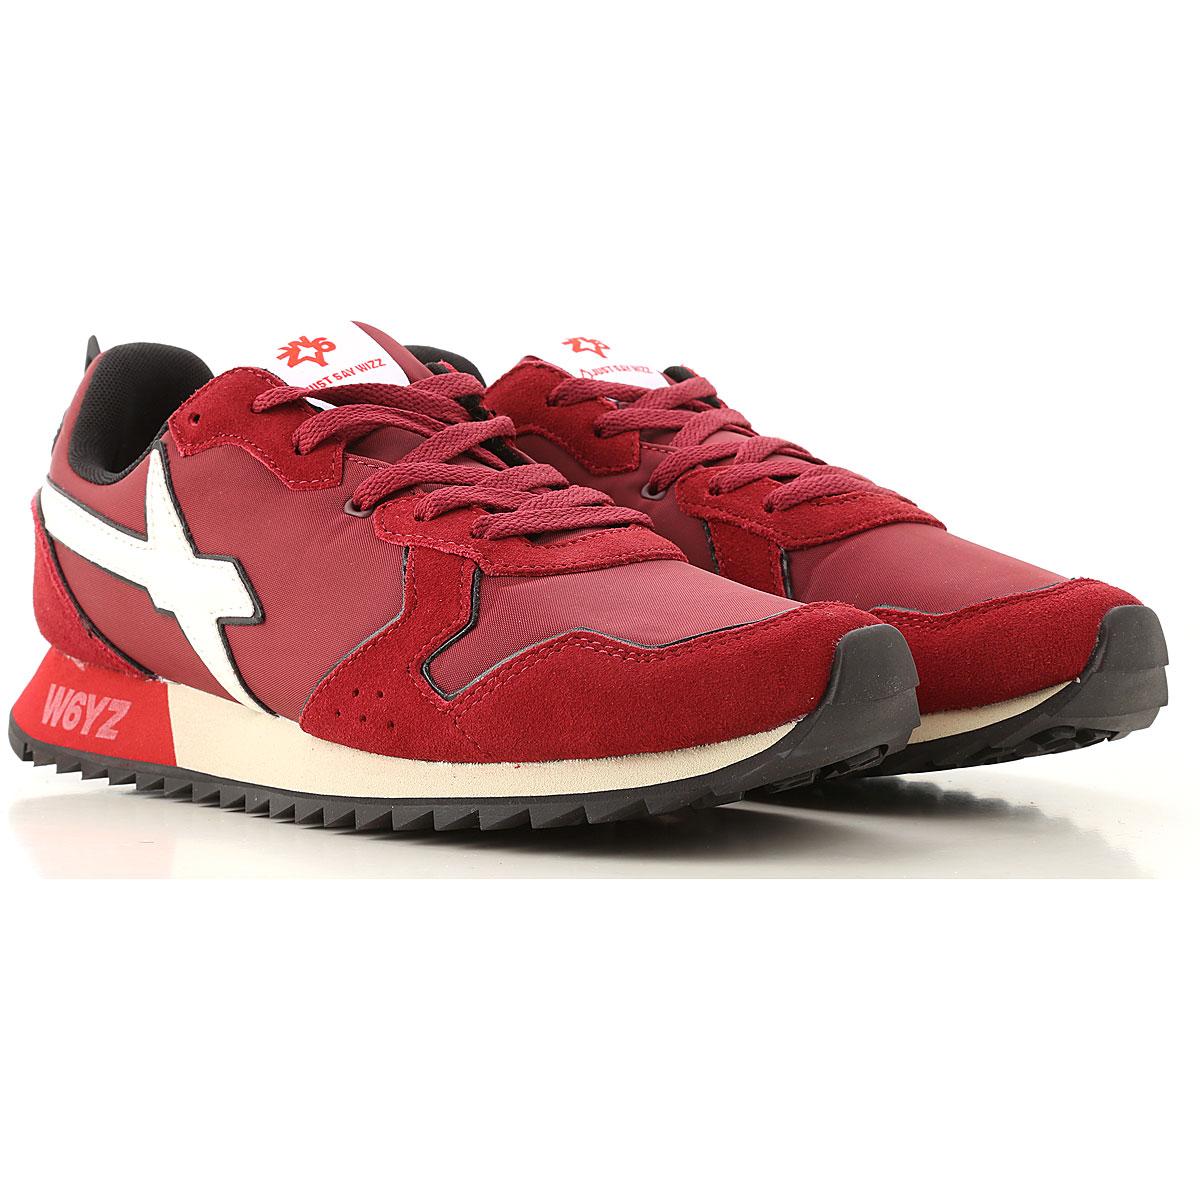 W6YZ Sneakers for Men On Sale, Bordeaux, Leather, 2019, 10 10.5 11.5 9